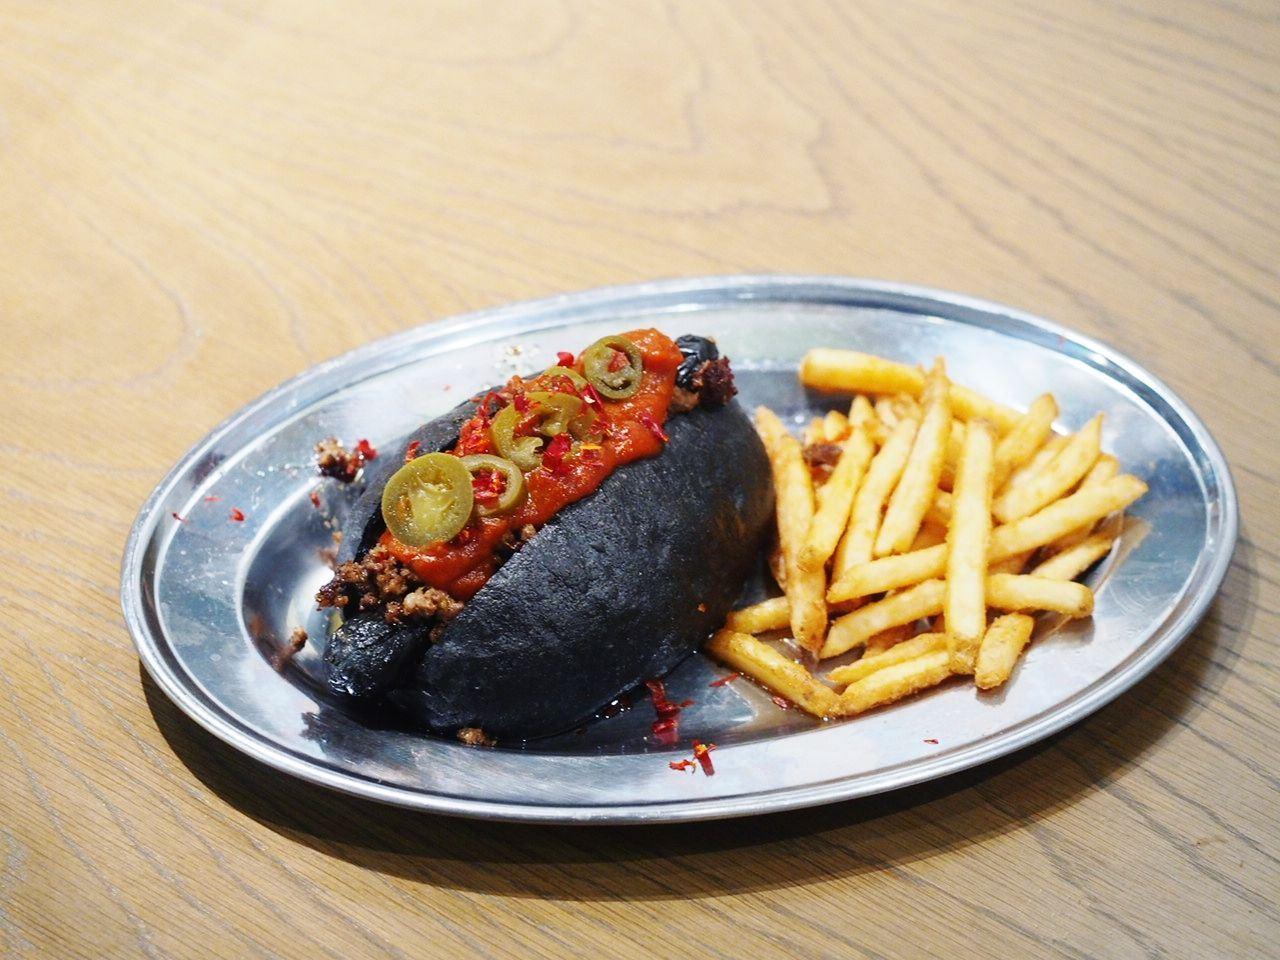 Spicy Black Hot Dog ¥1390